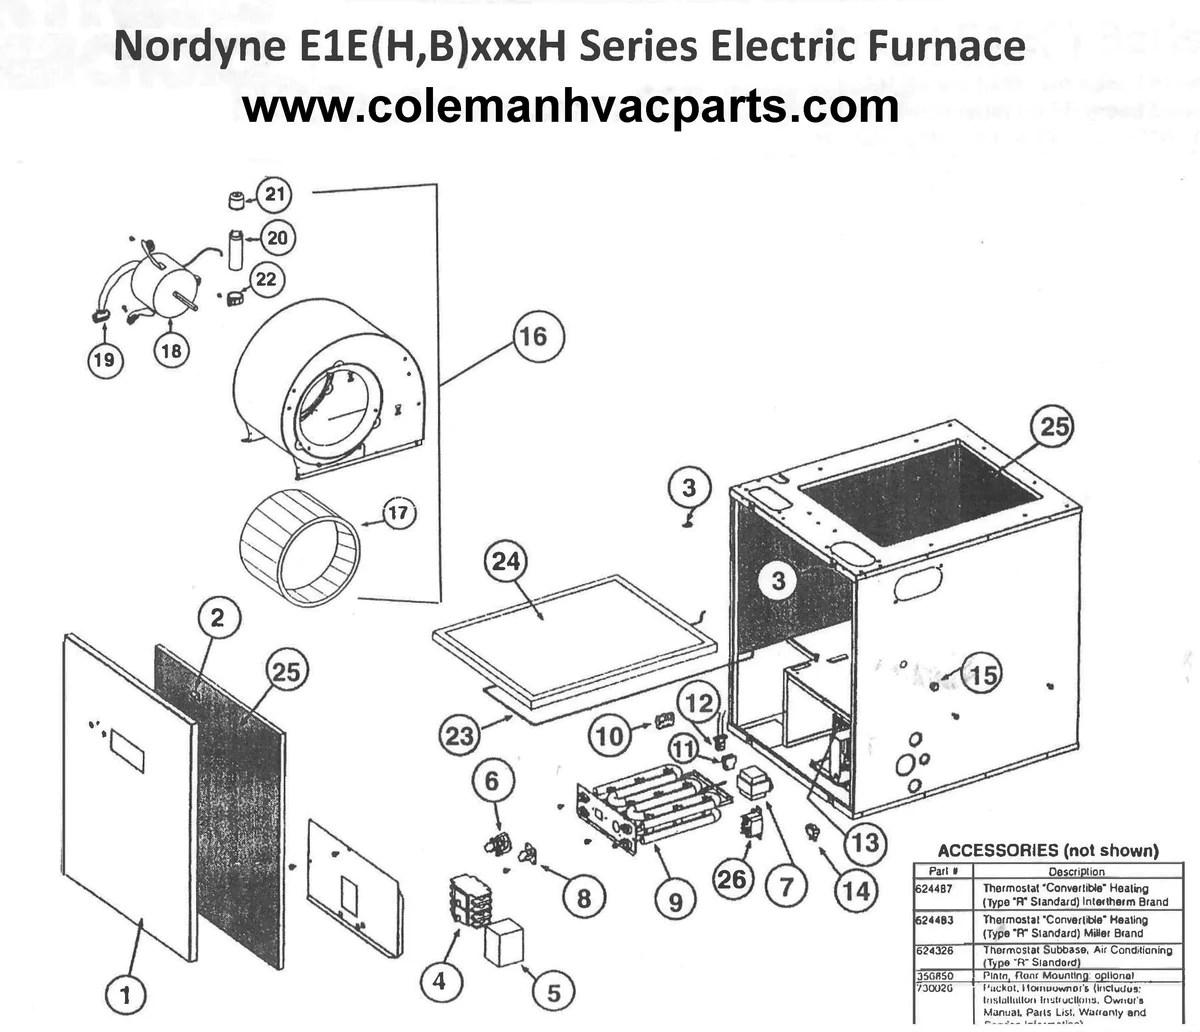 hight resolution of intertherm mobile home furnace parts diagram 5 15 fuss atelier de u2022intertherm 9